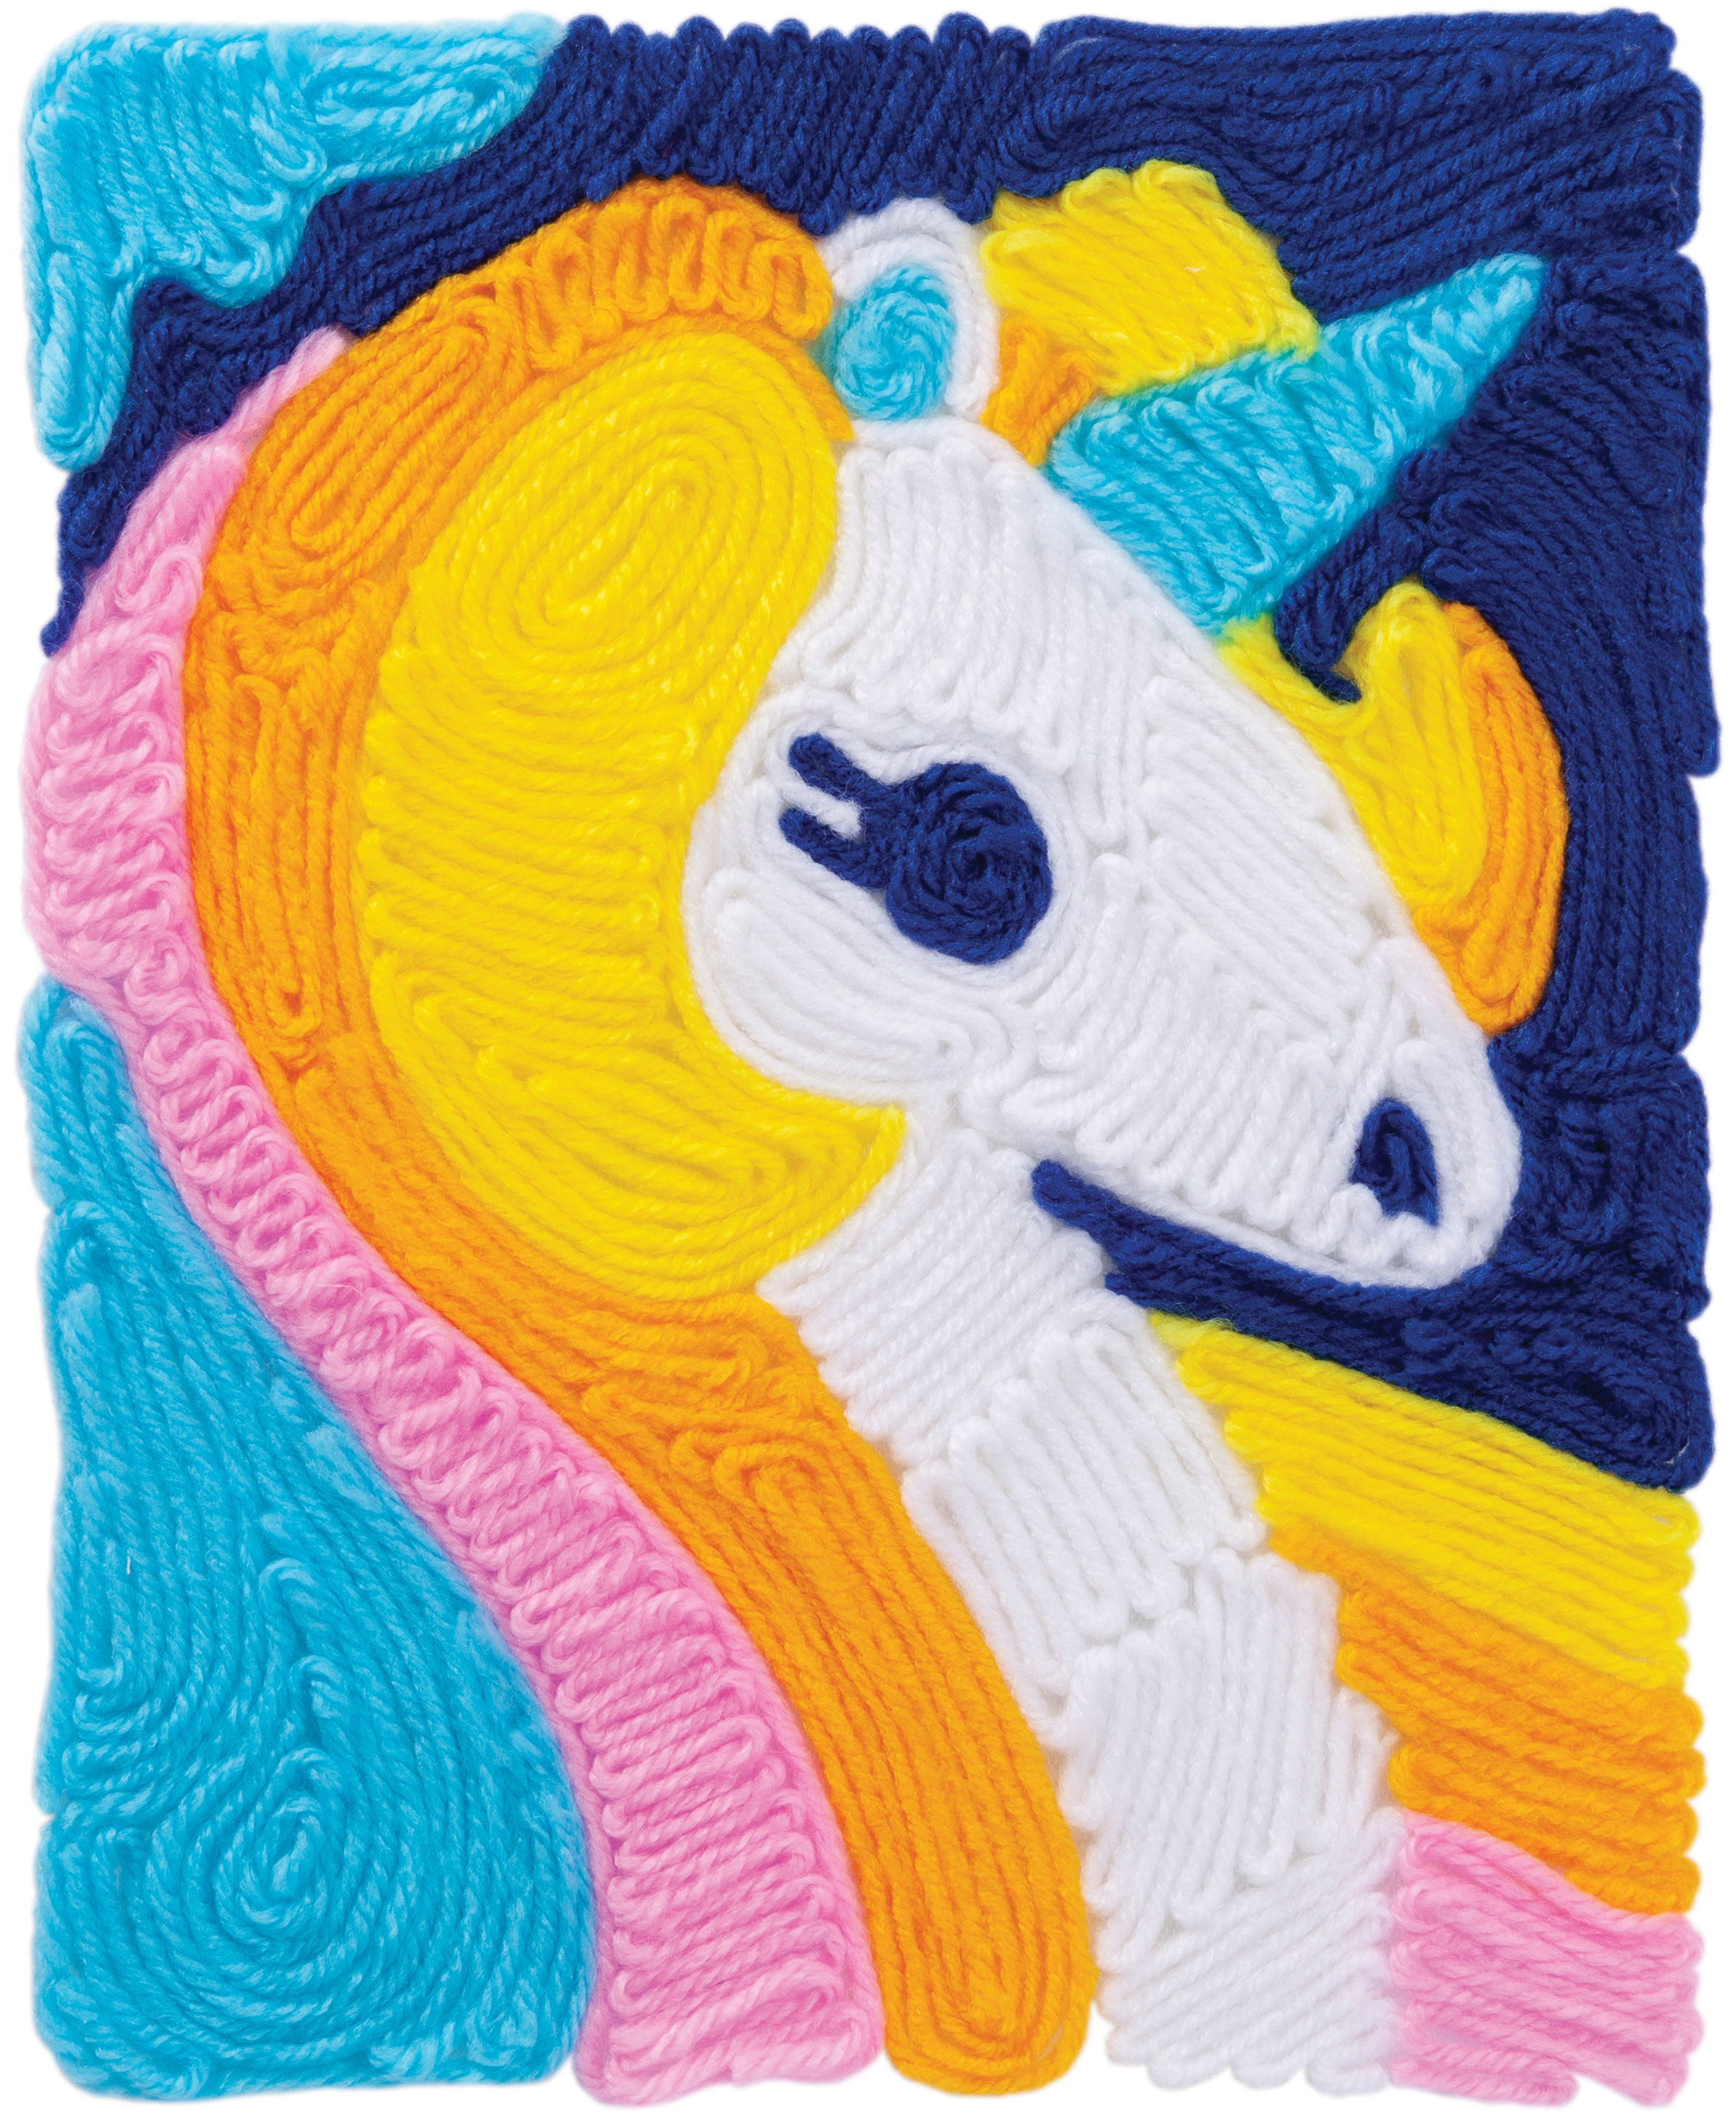 Y'art Craft Kit-Unicorn